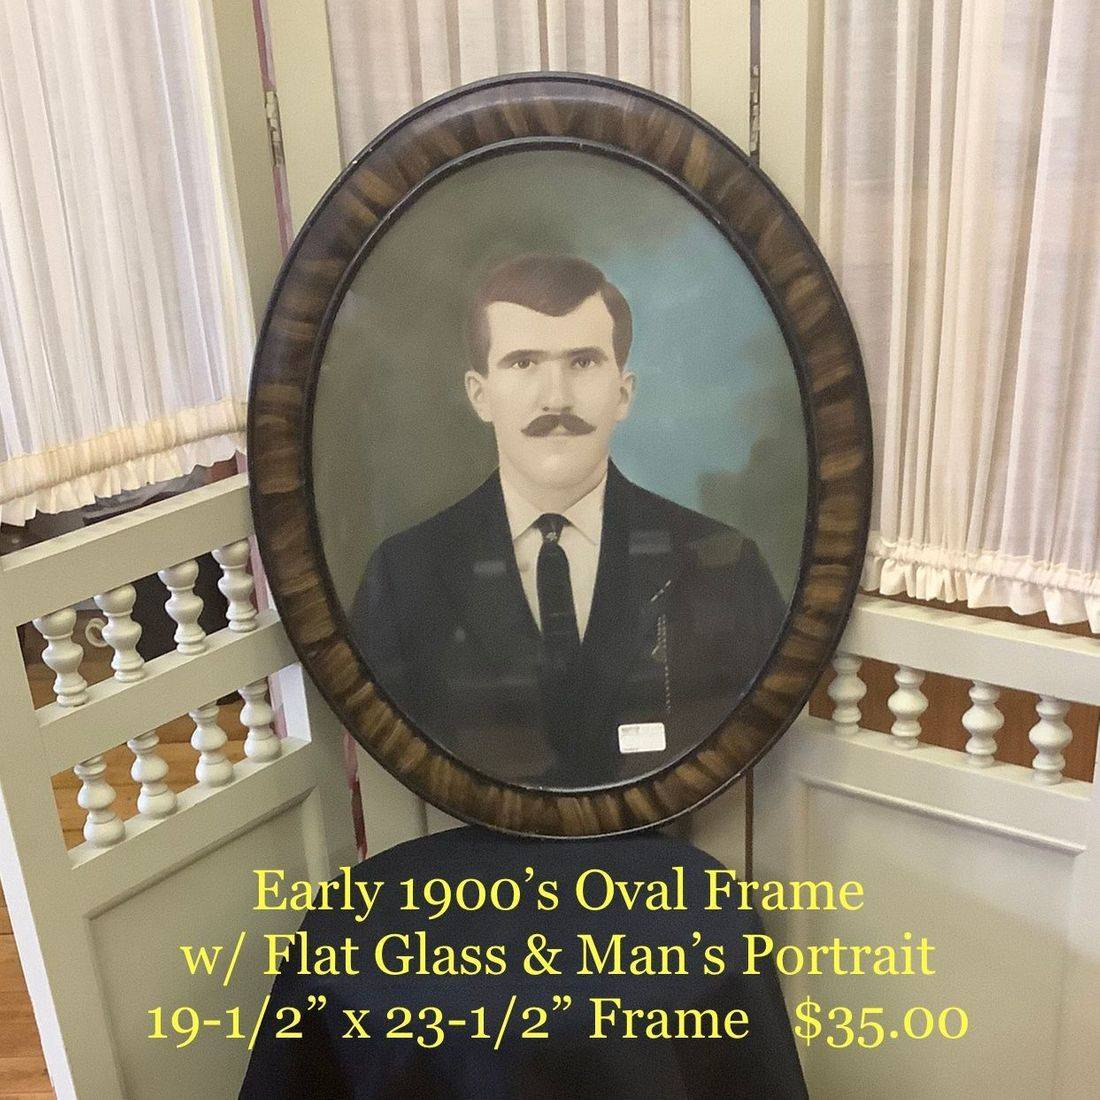 Early 1900's Oval Frame w/Man's Portrait  $35.00